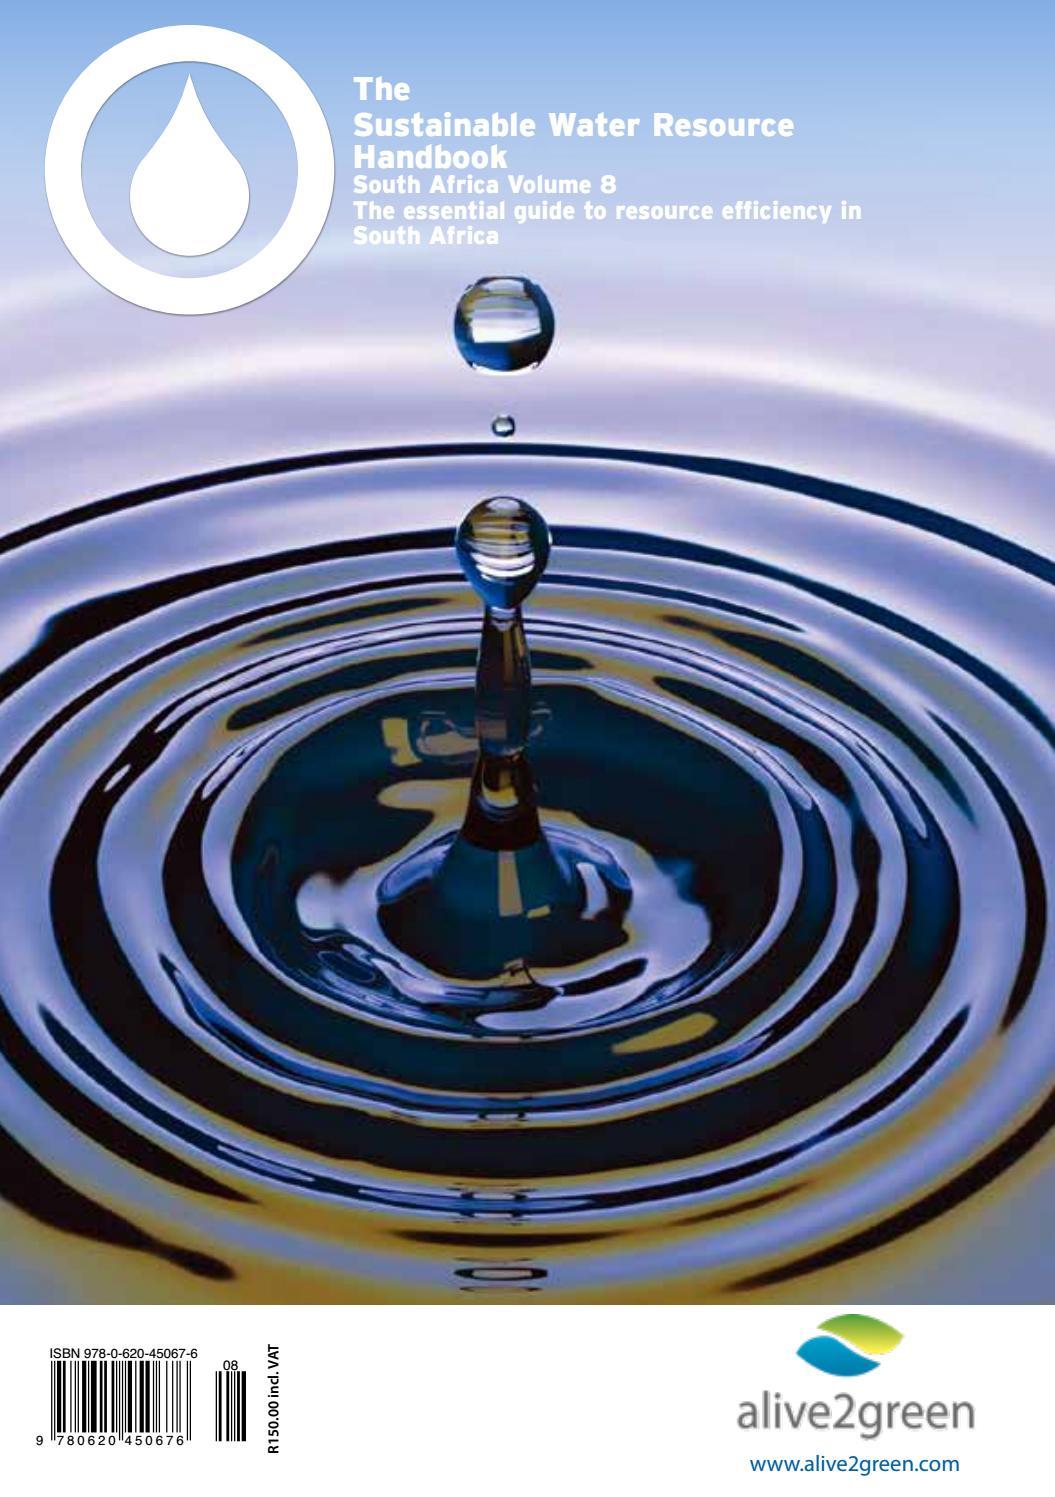 Obc in irregular water bottom